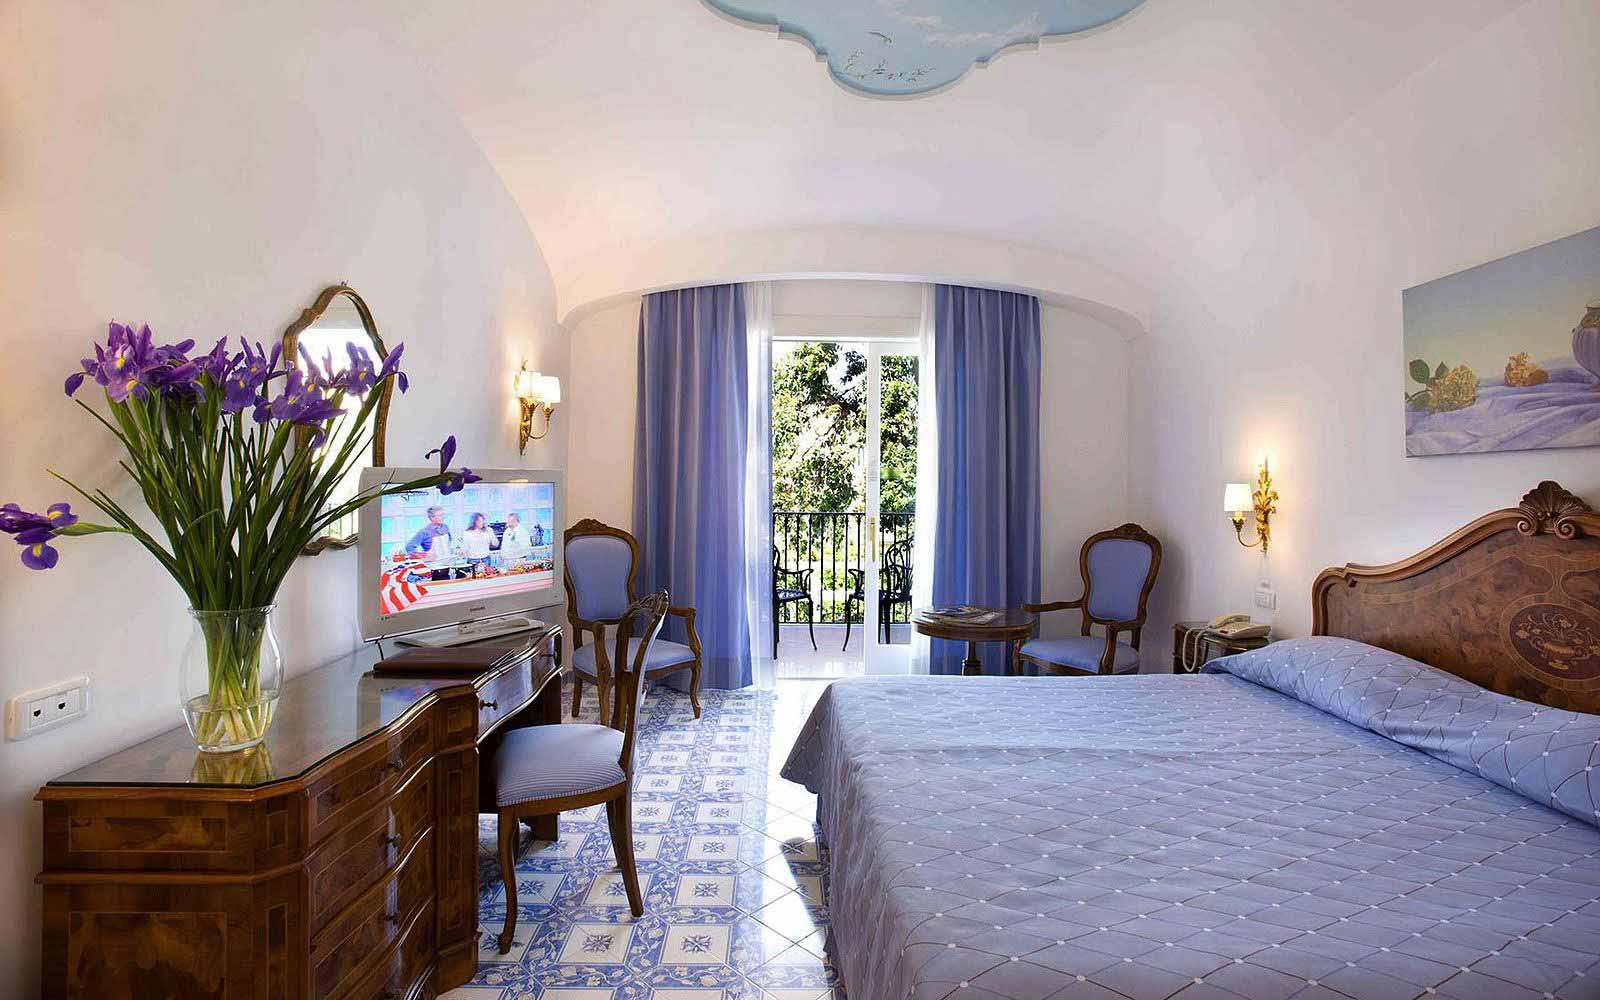 Superior Room at the Grand Hotel La Favorita